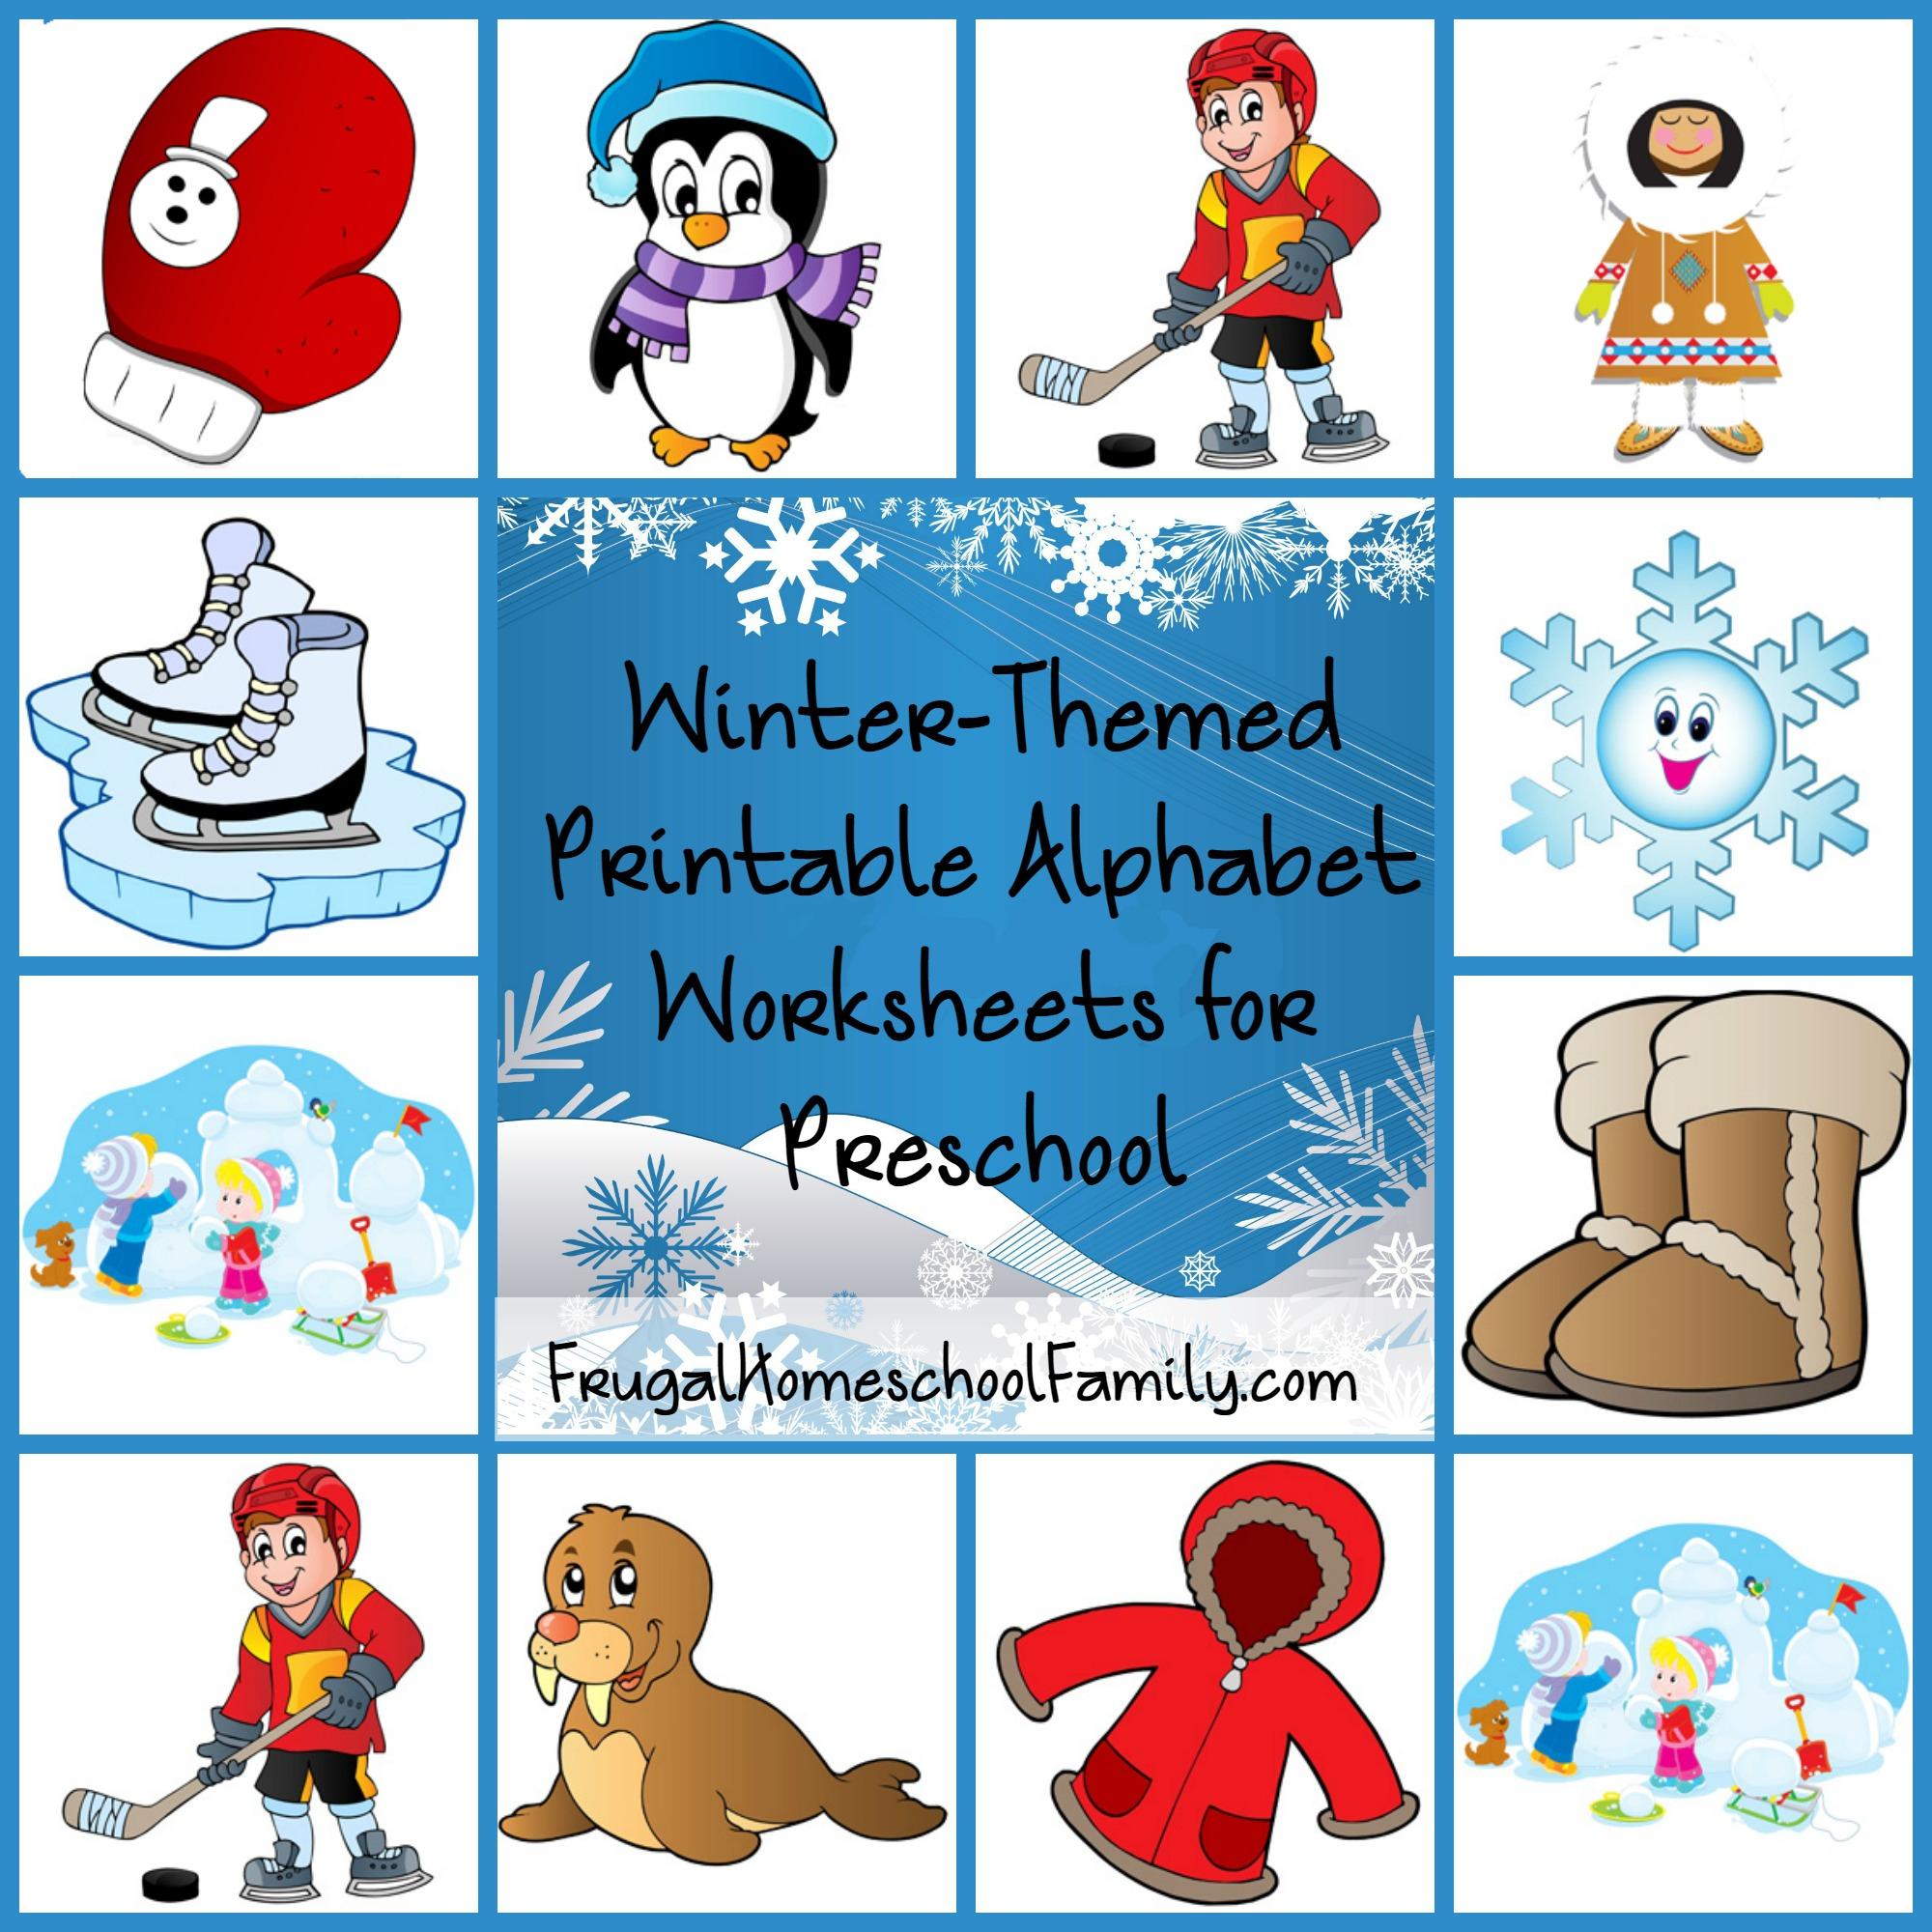 Free Winter-Themed Printable Alphabet Worksheets For Preschool - Free Printable Winter Preschool Worksheets